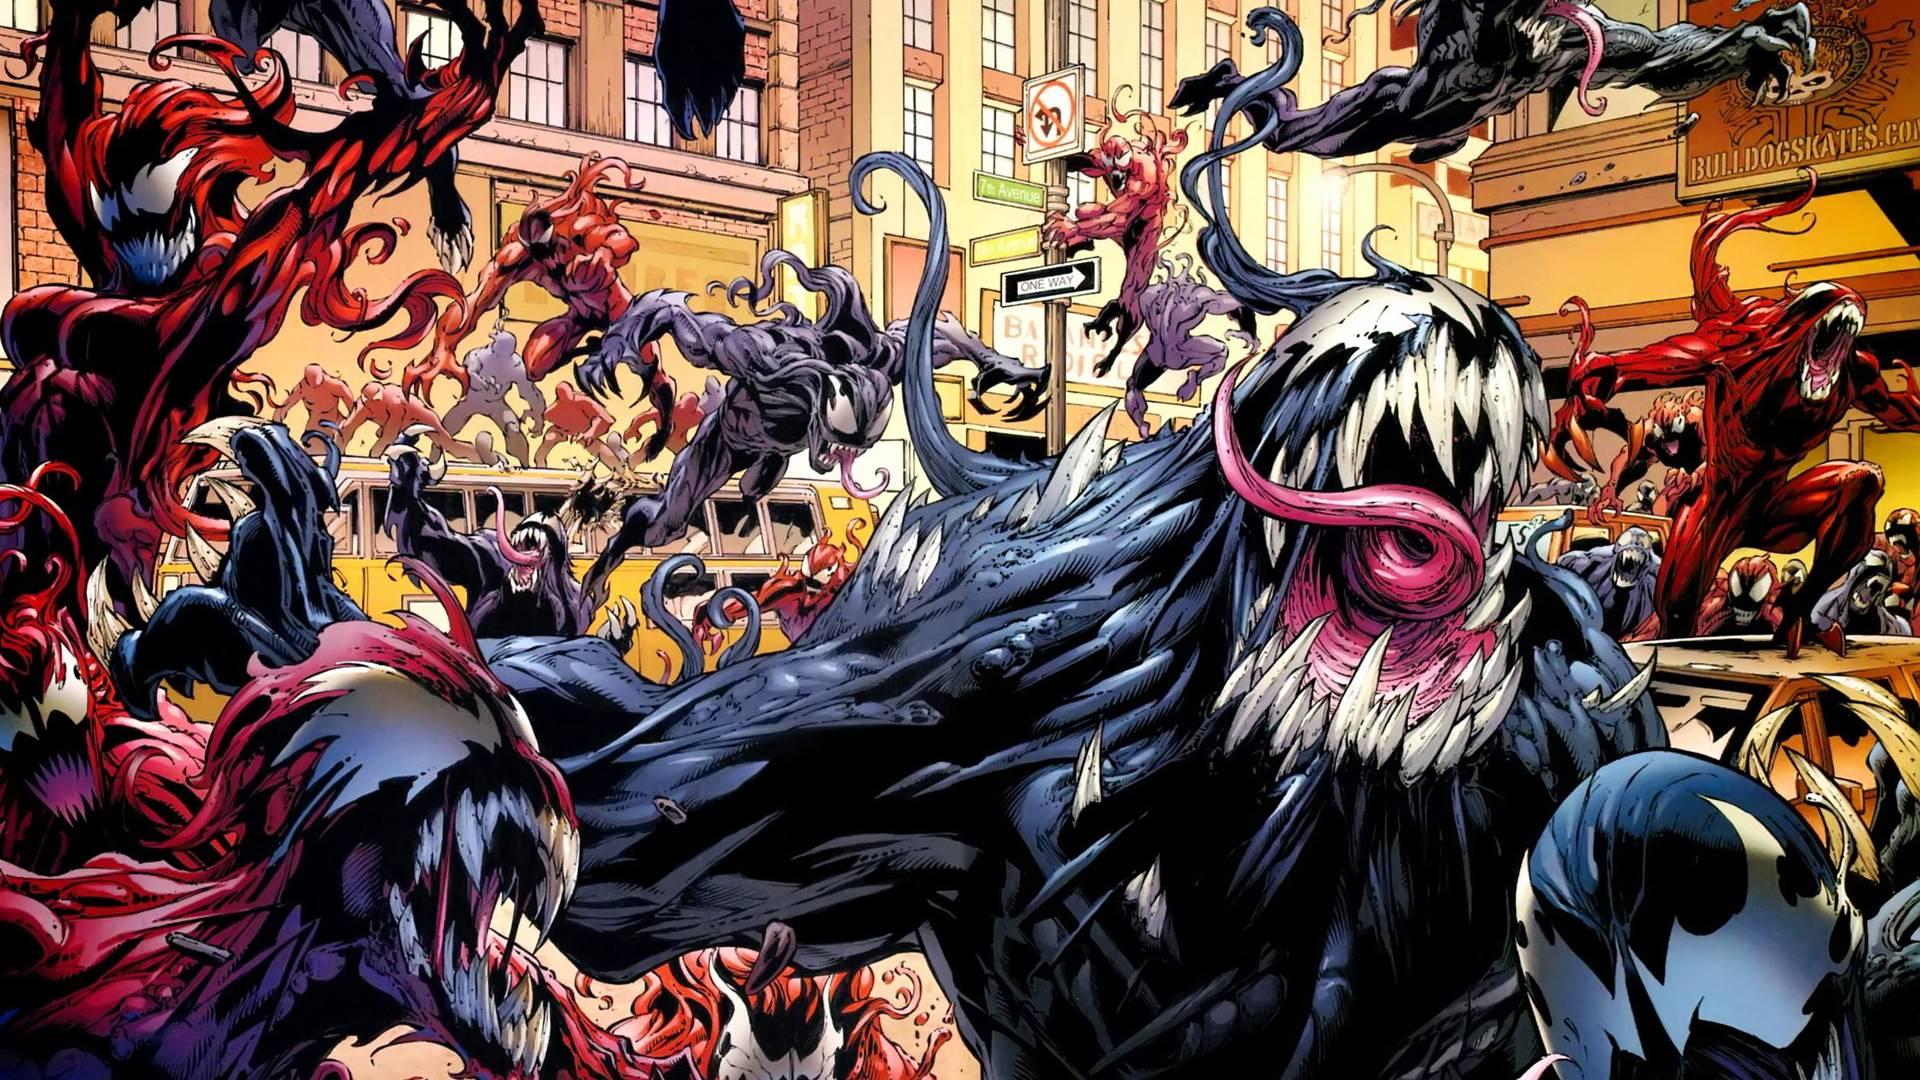 comic book wallpaper hd #8